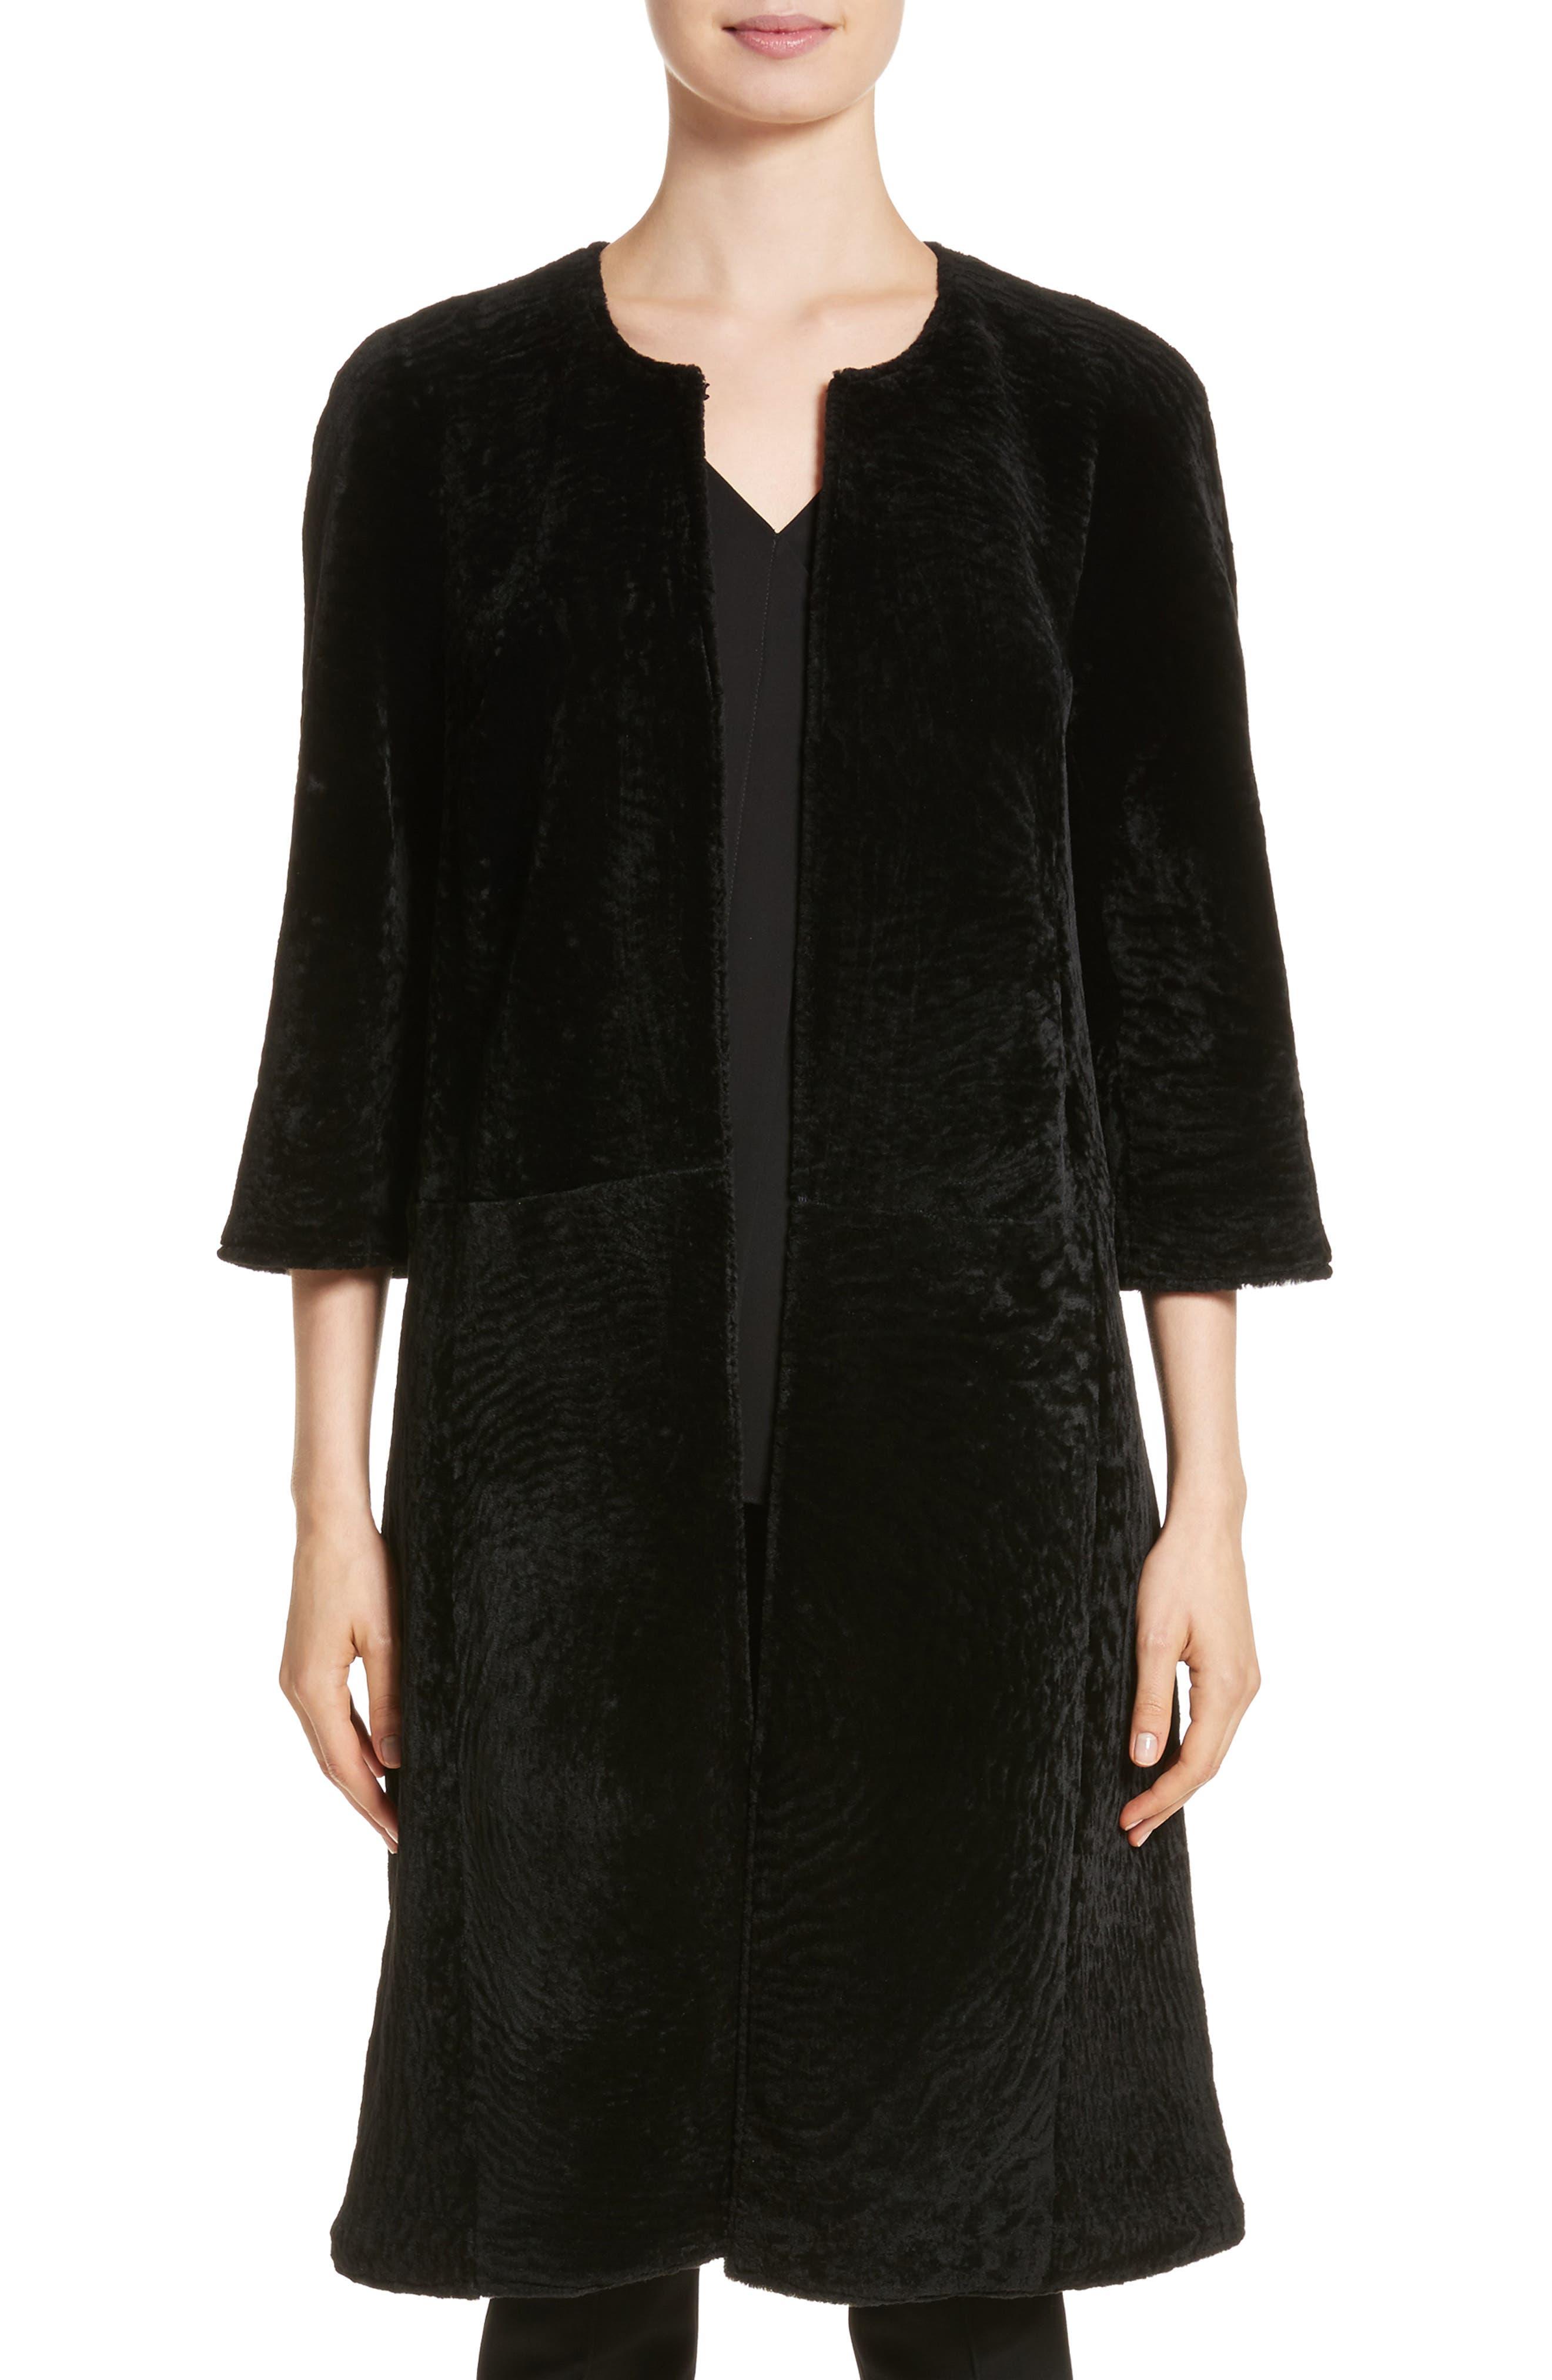 Main Image - St. John Collection Genuine Textured Lamb Fur Jacket